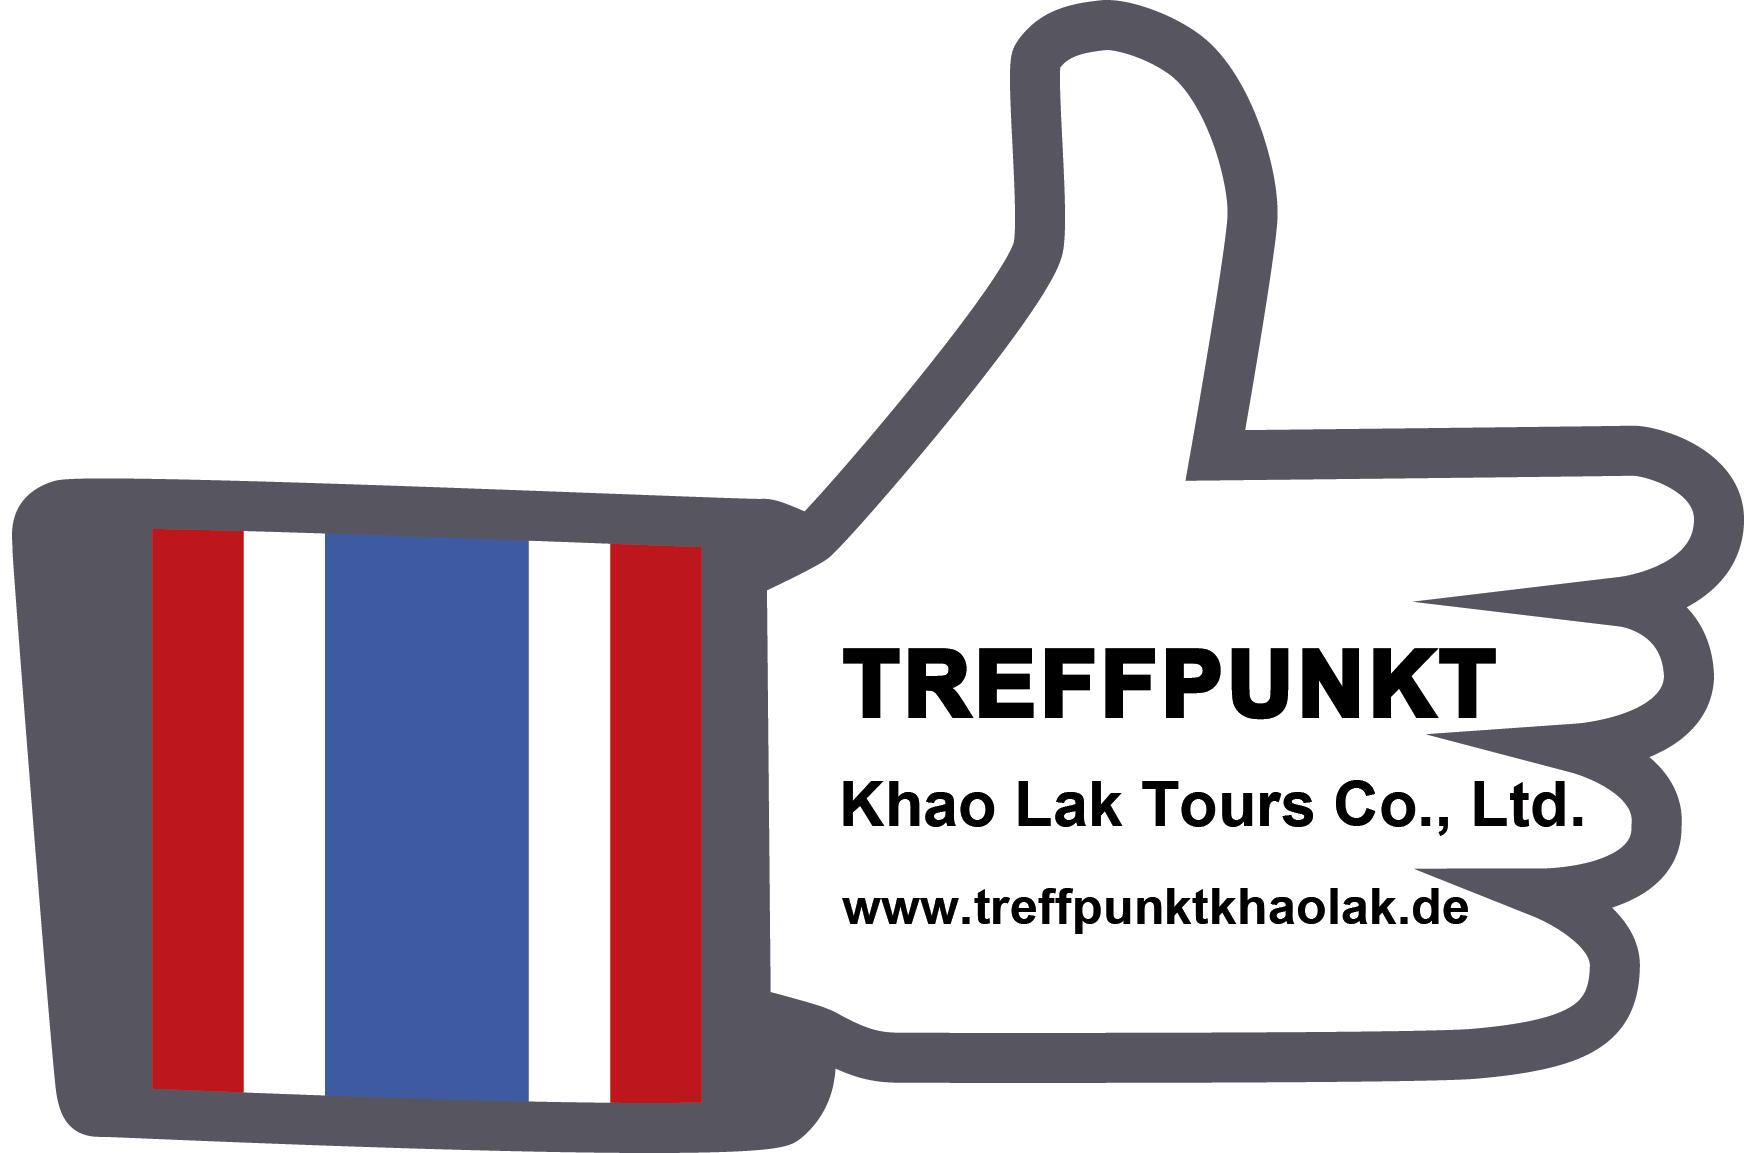 Treffpunkt Khao Lak